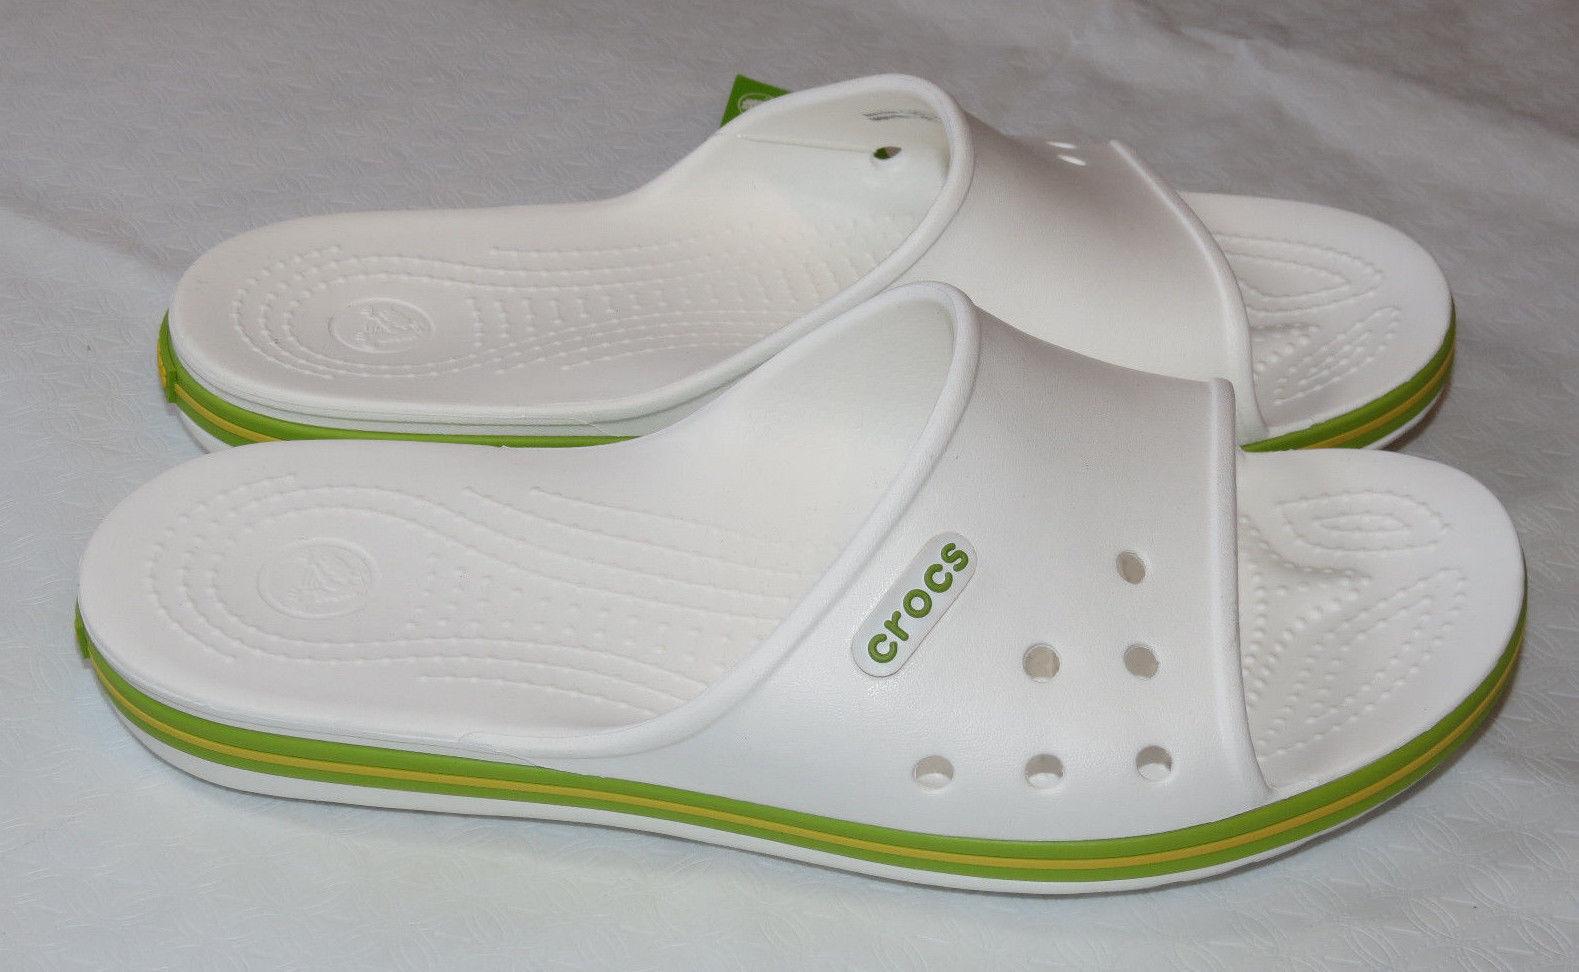 c0937cbb6 Crocs Crocband II Slide White Volt Green and 26 similar items